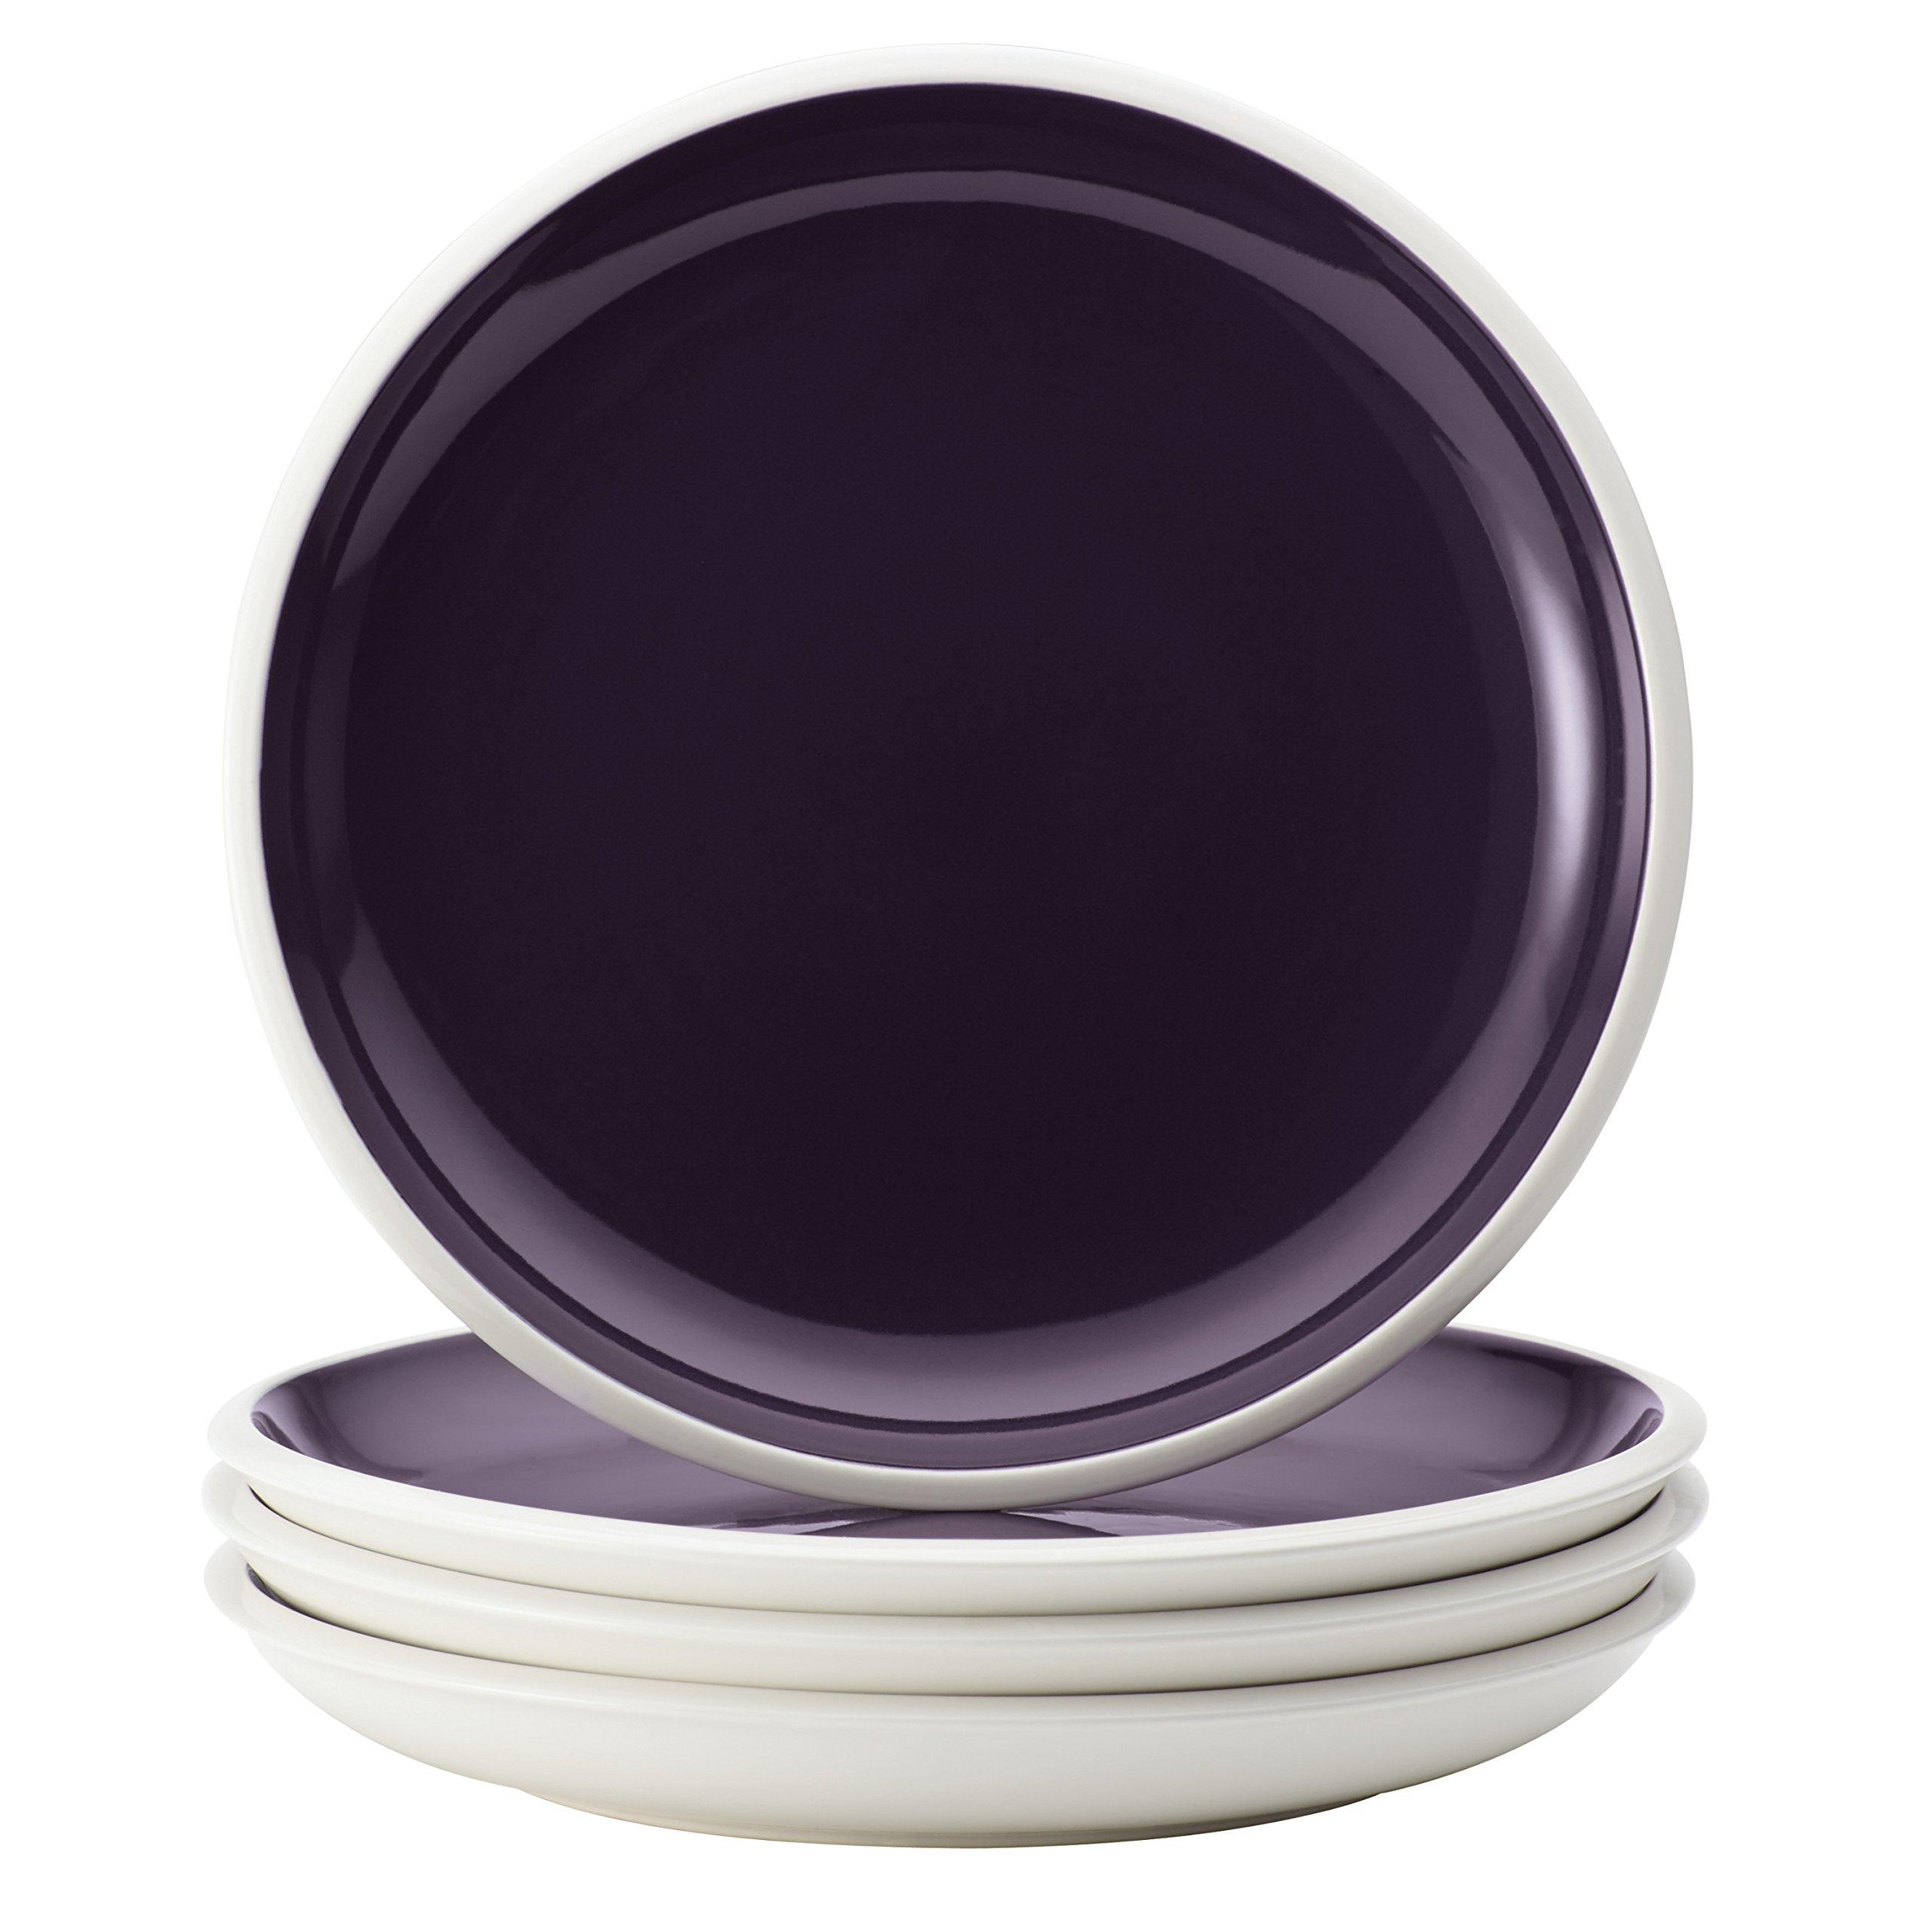 Rachael Ray 58721 Dinnerware Rise Stoneware Salad Plate Set, 4 Piece, Purple